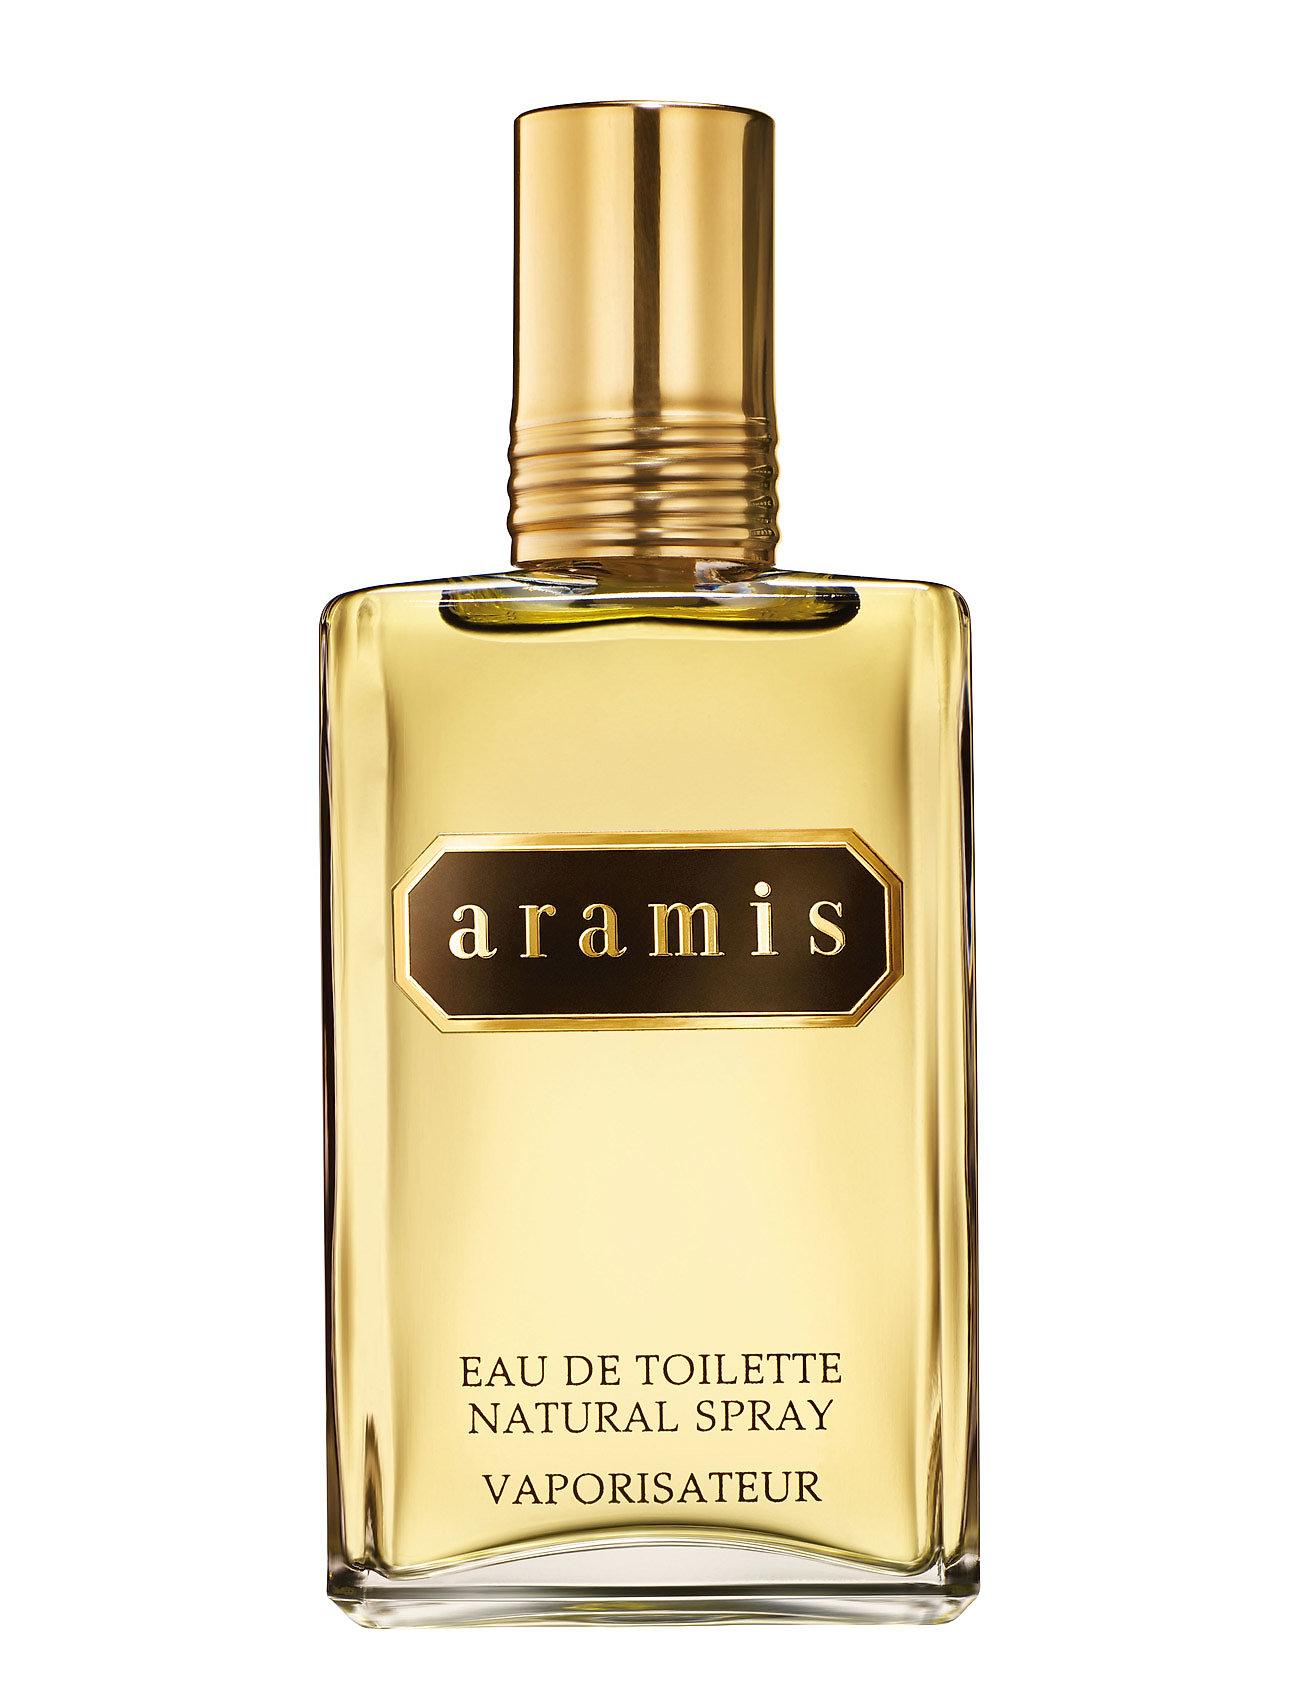 aramis – Aramis aramis eau de toilette fra boozt.com dk